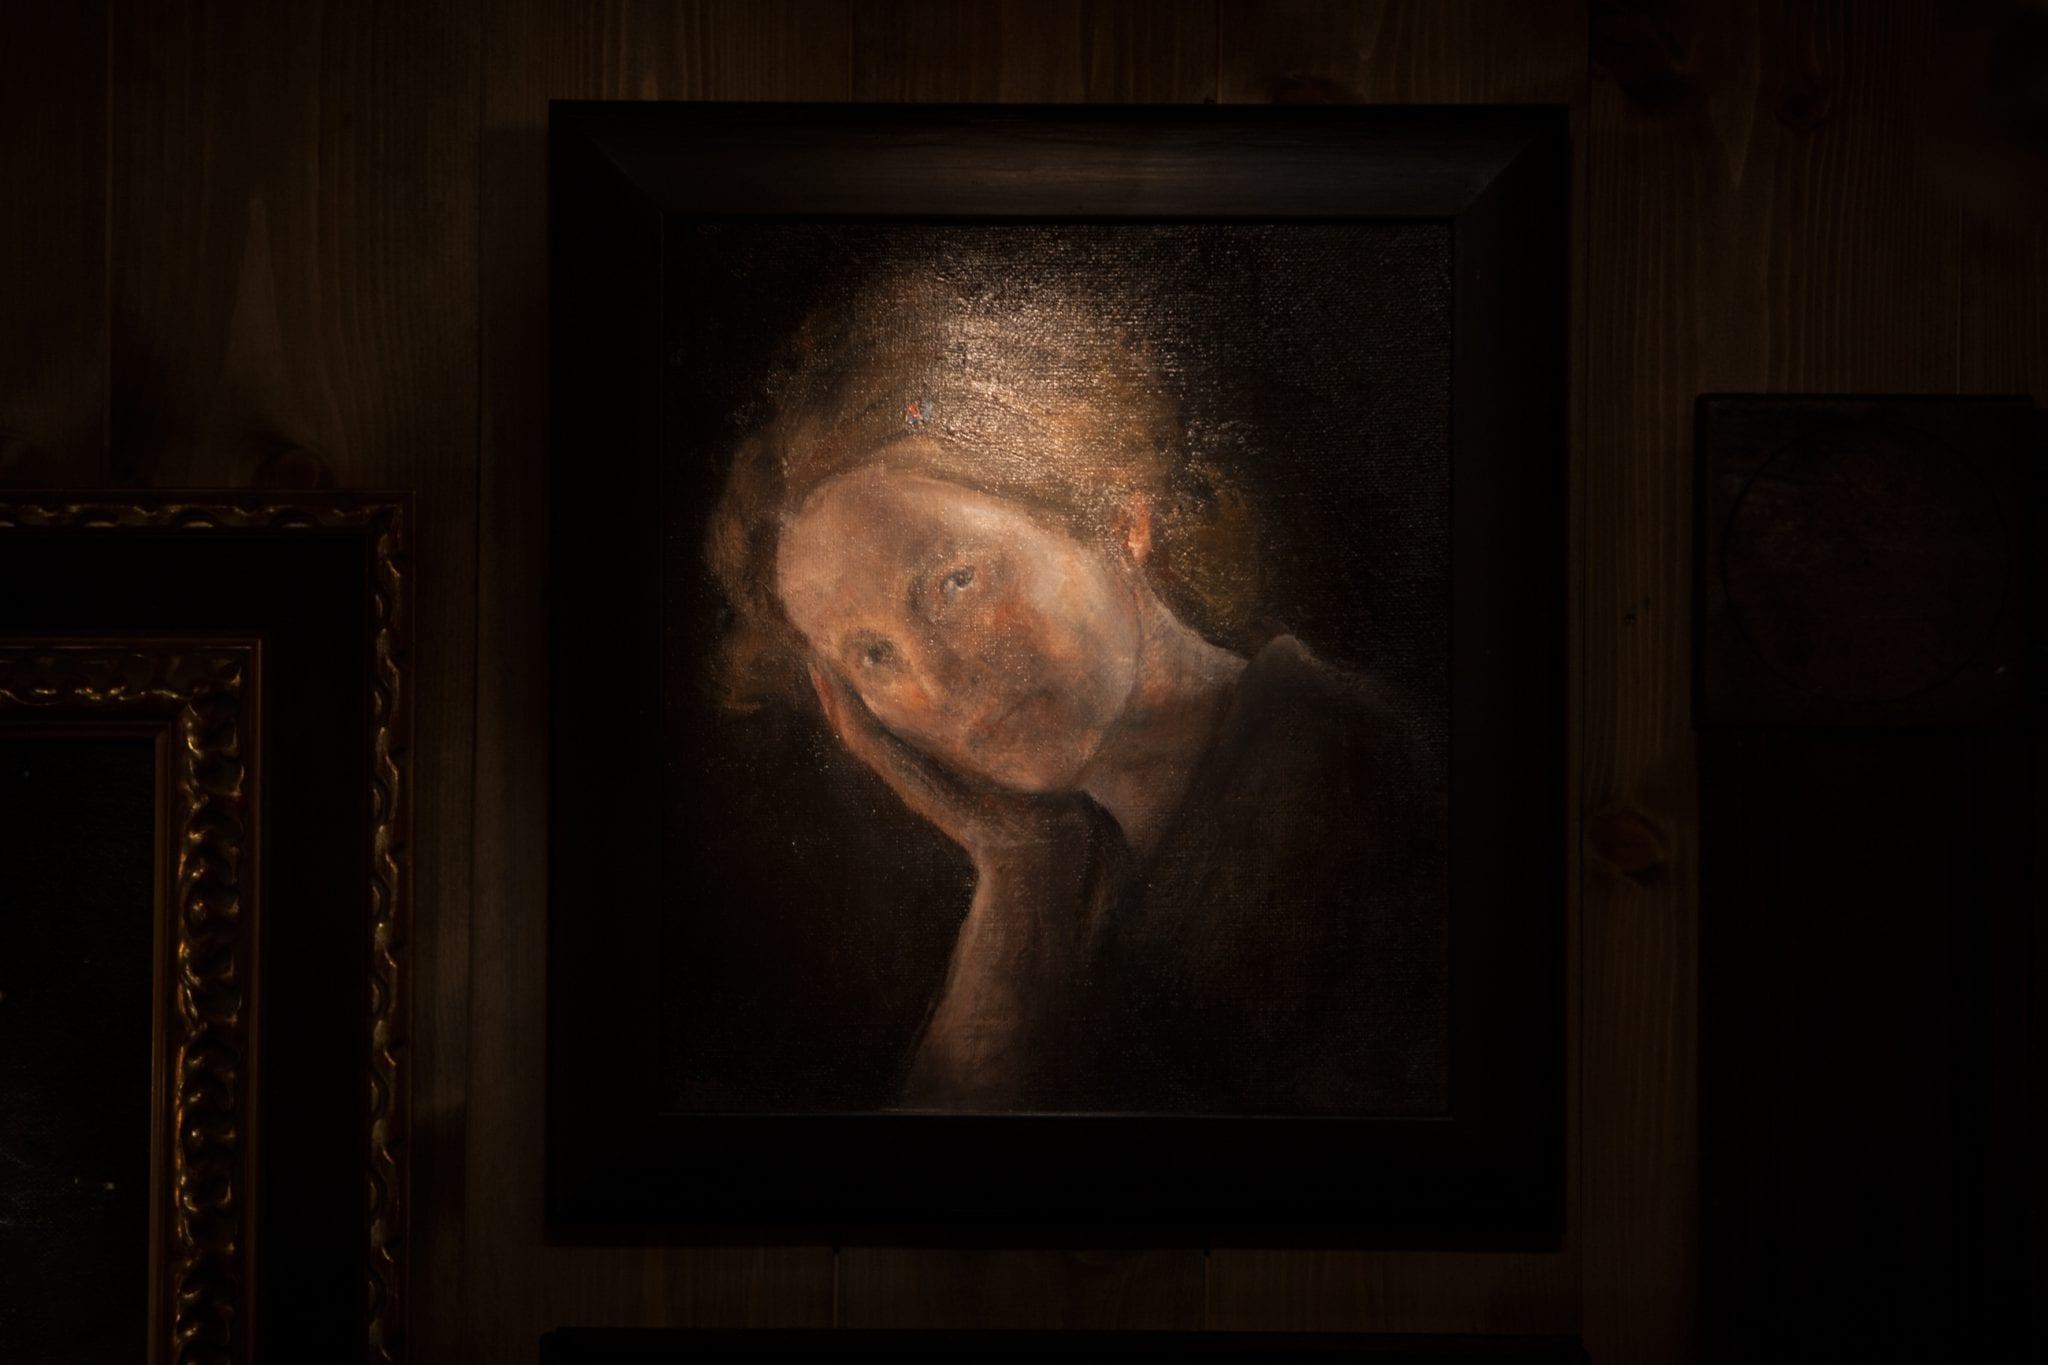 Cave of Apelles by Nerdrum School: Joakim Ericsson on Life in Gaming Turid Spildo Nerdrum self portrait Herland Report